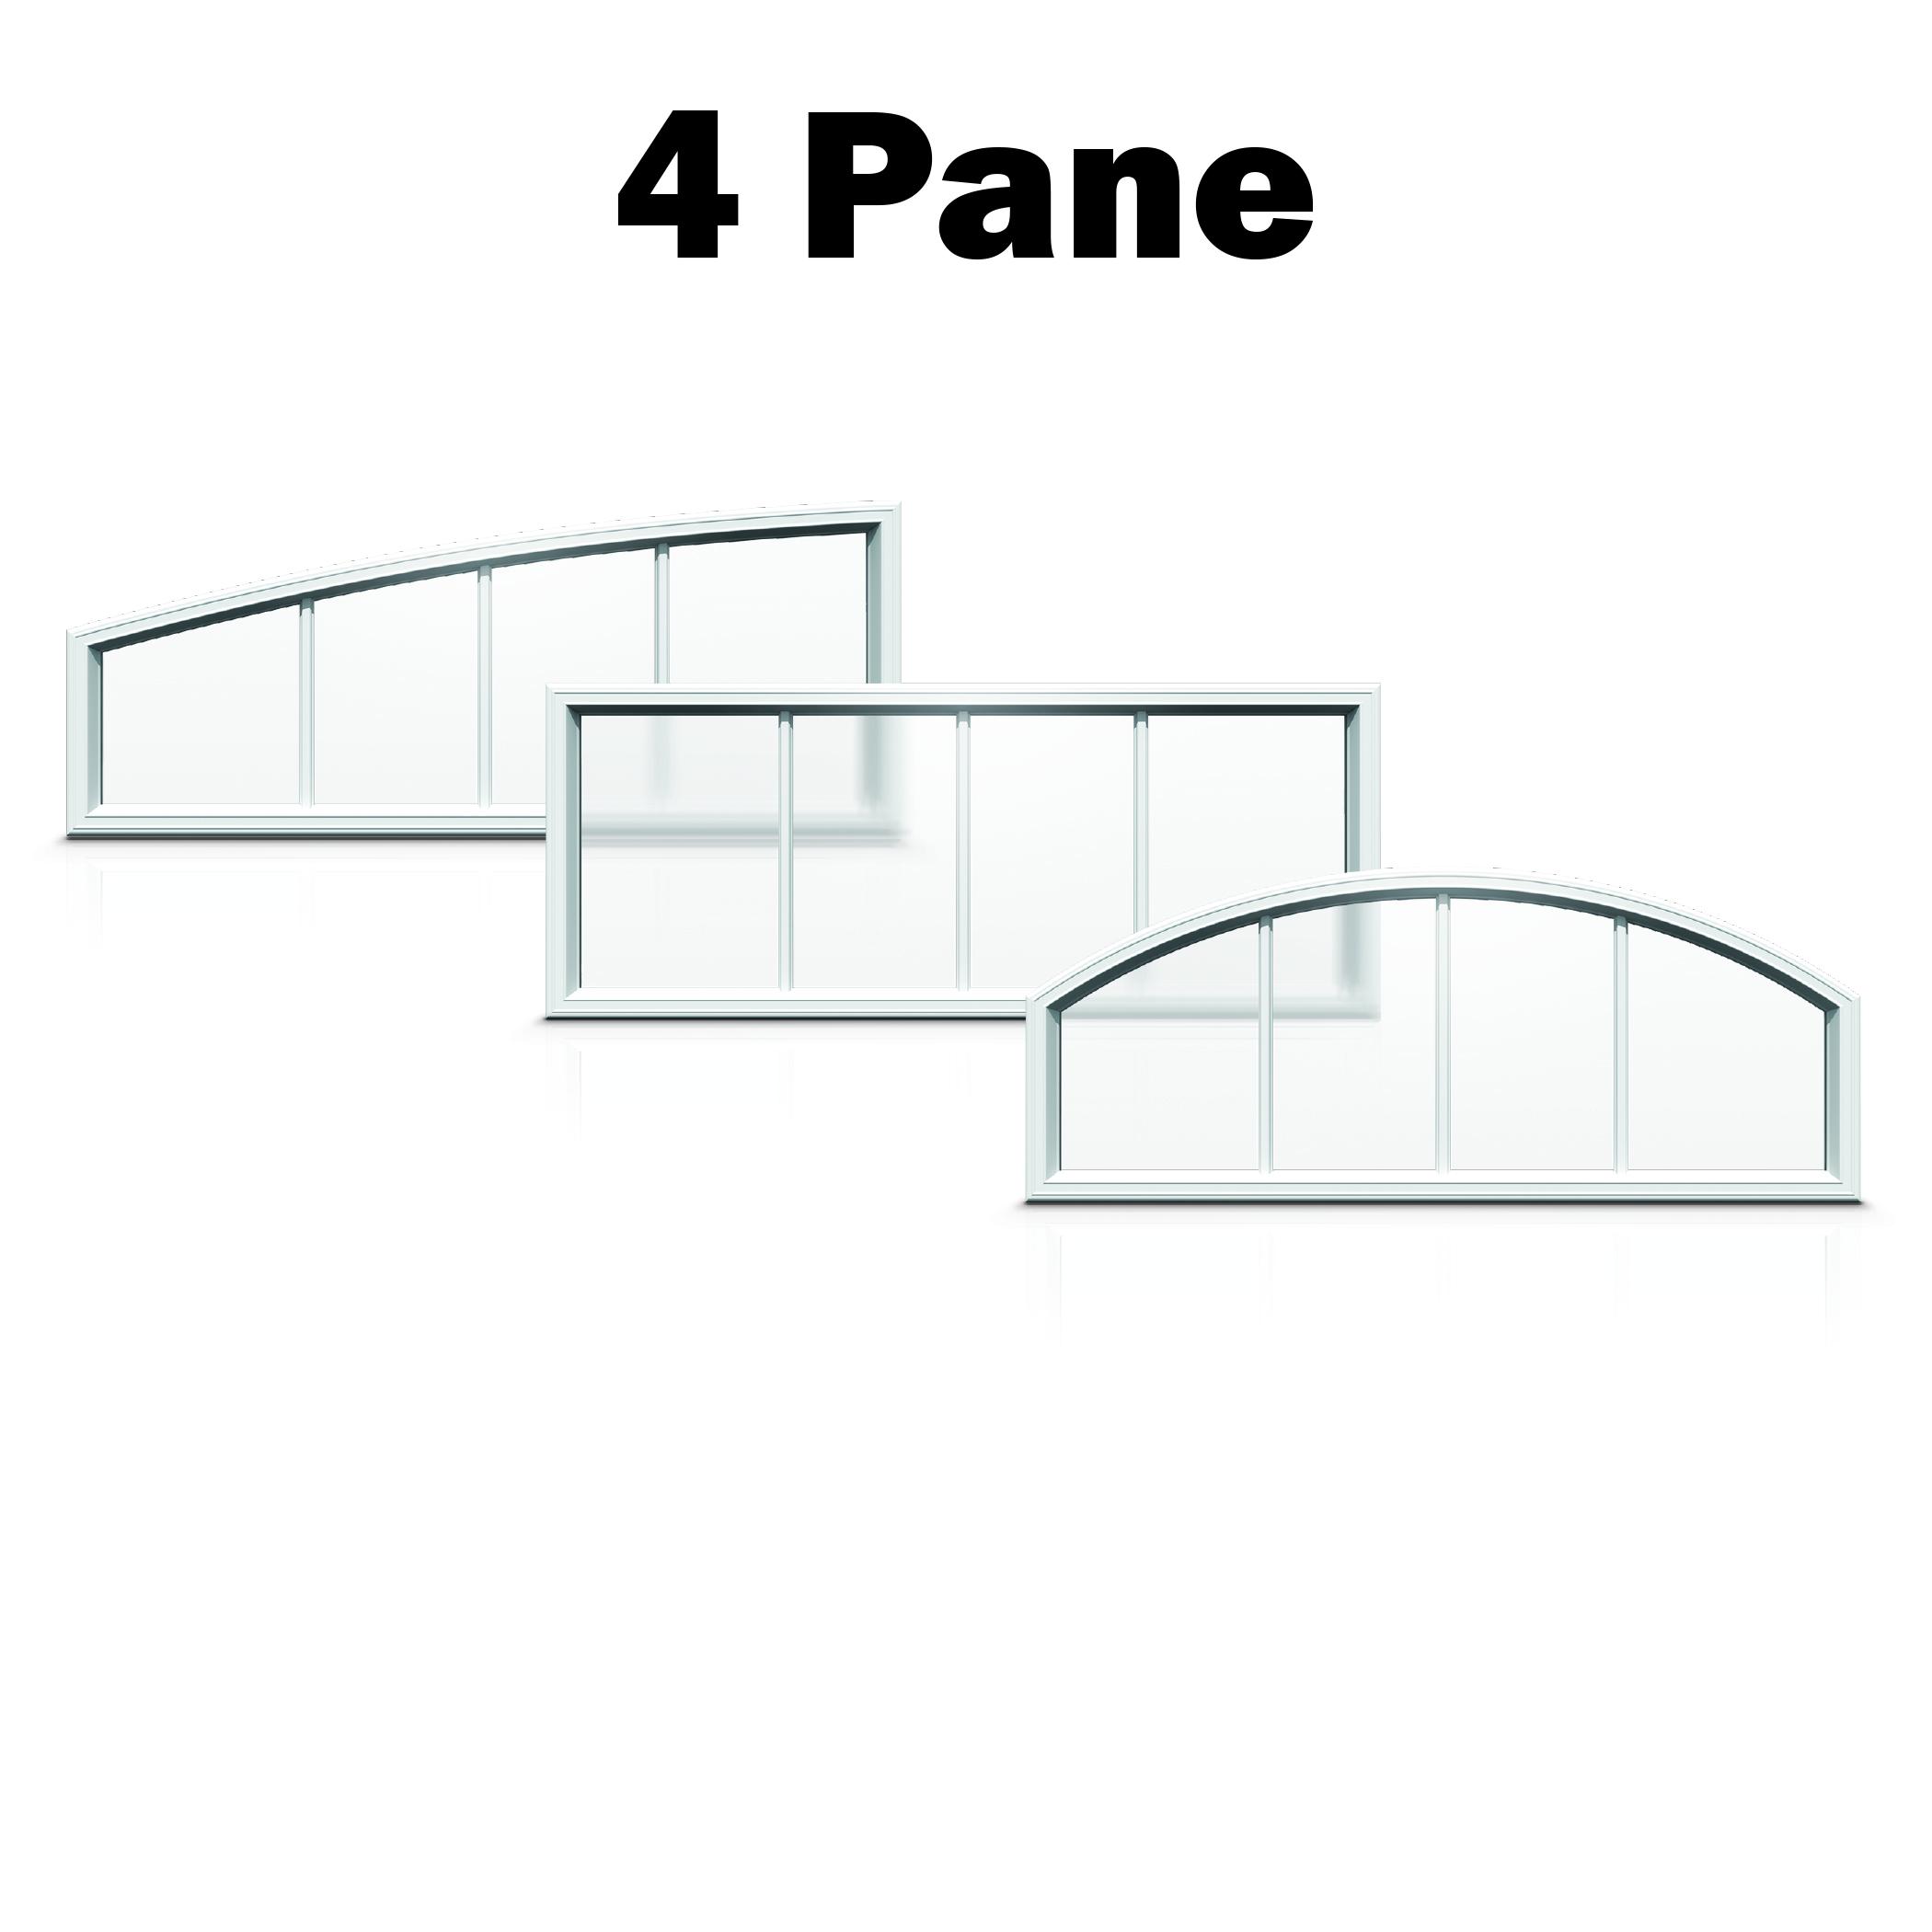 4 Pane - Briarcrest.jpg